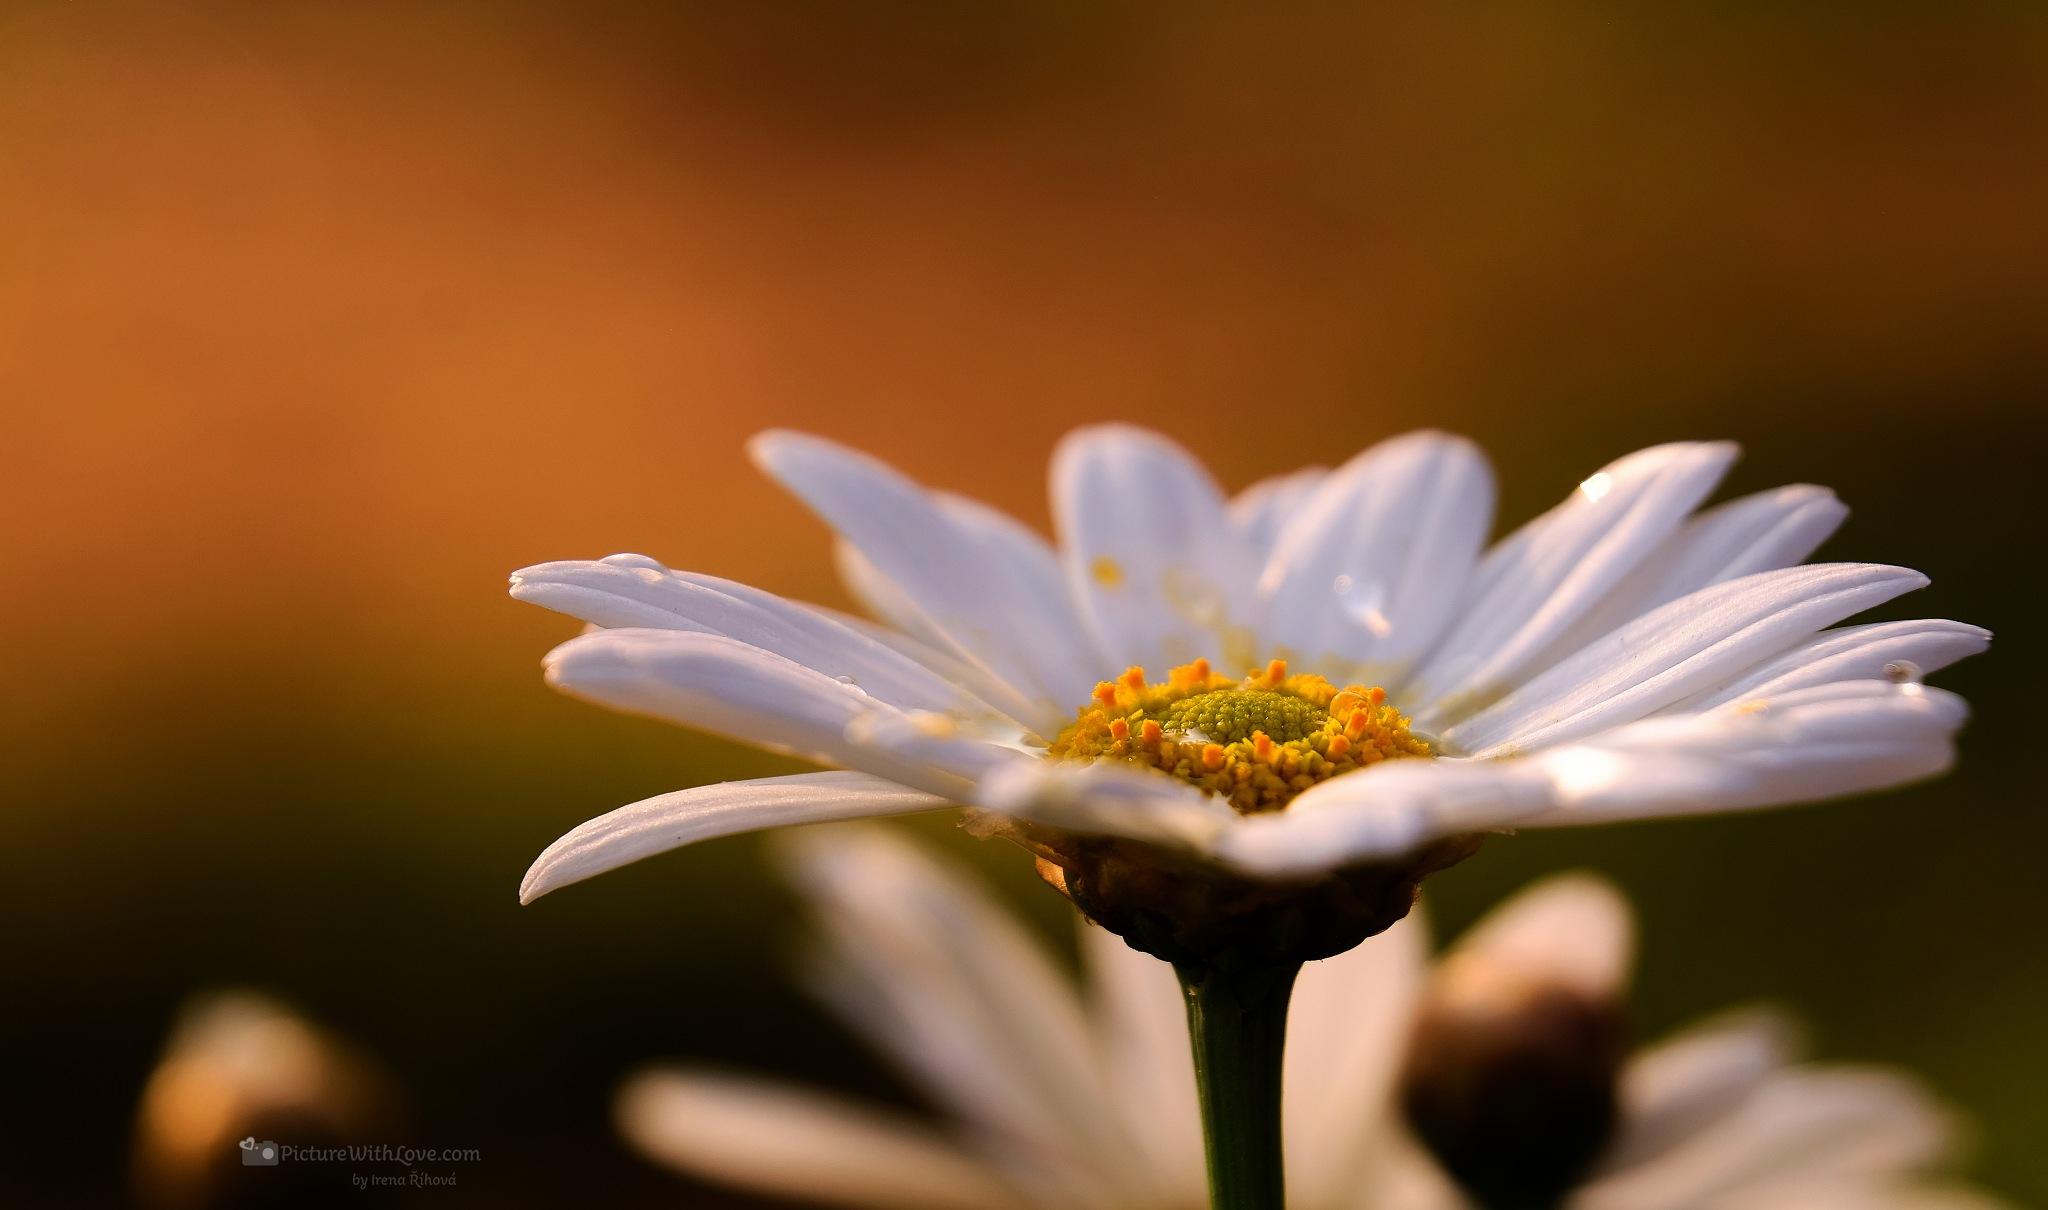 ox-eye daisy (Leucanthemum vulgare) by Irena Rihova